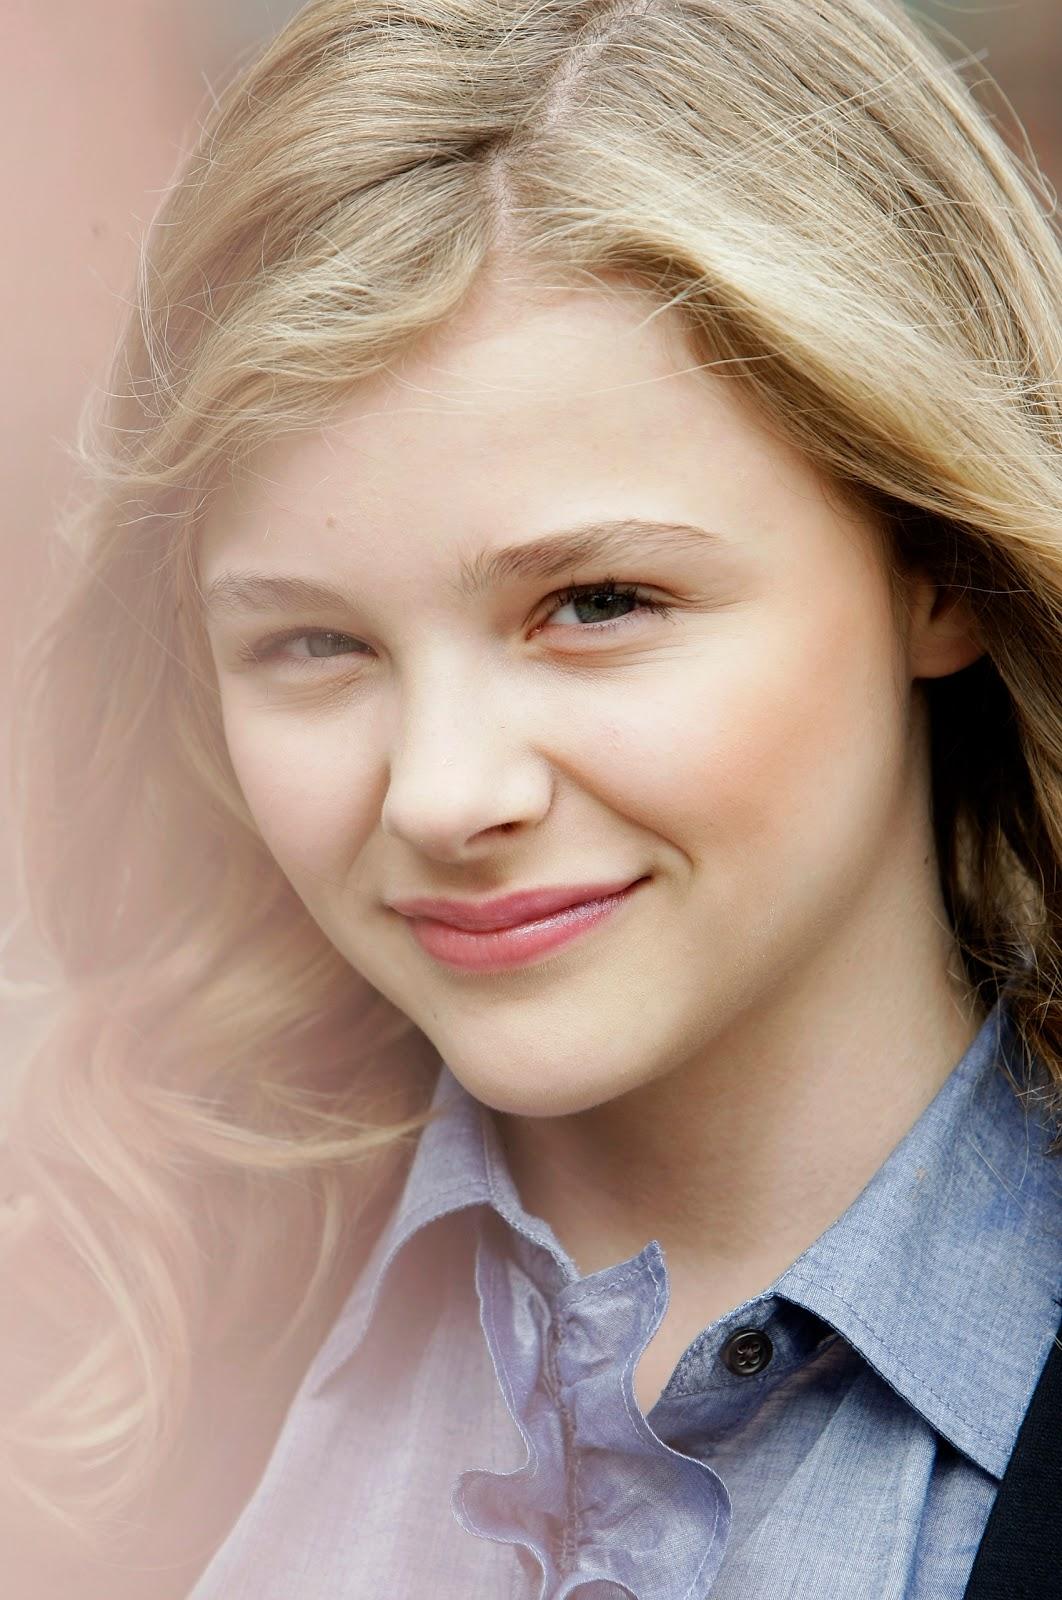 Chloe Grace Moretz pictures gallery (4) | Film Actresses